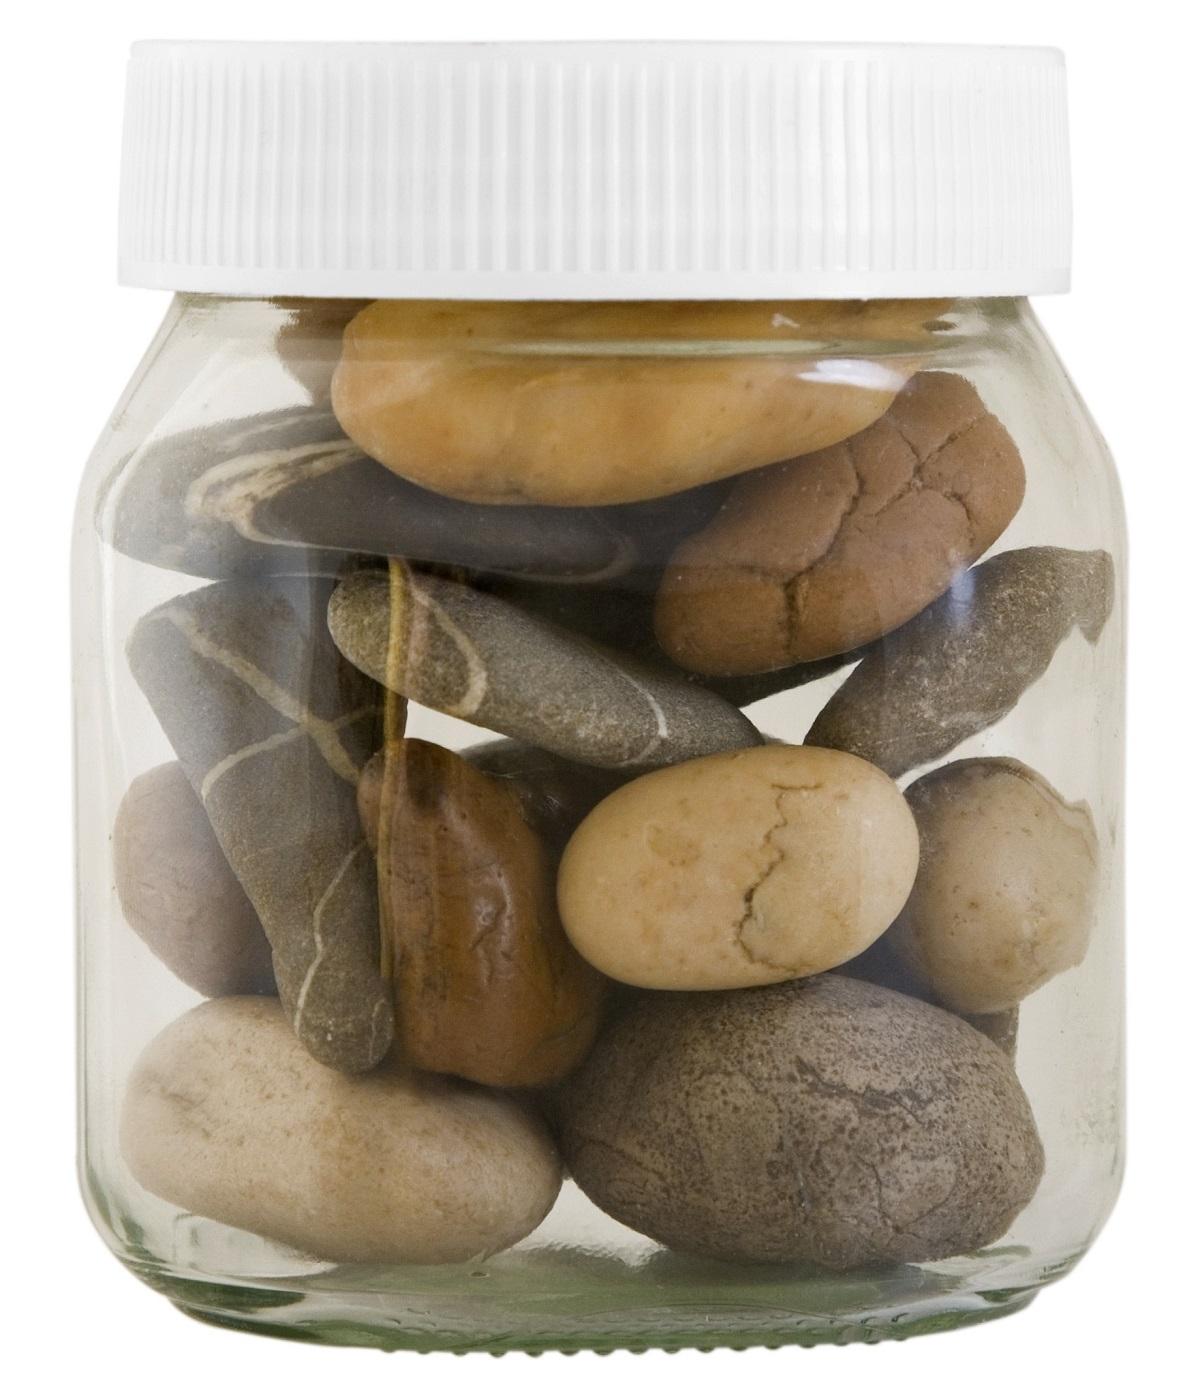 jar of rocks cropped 1K px